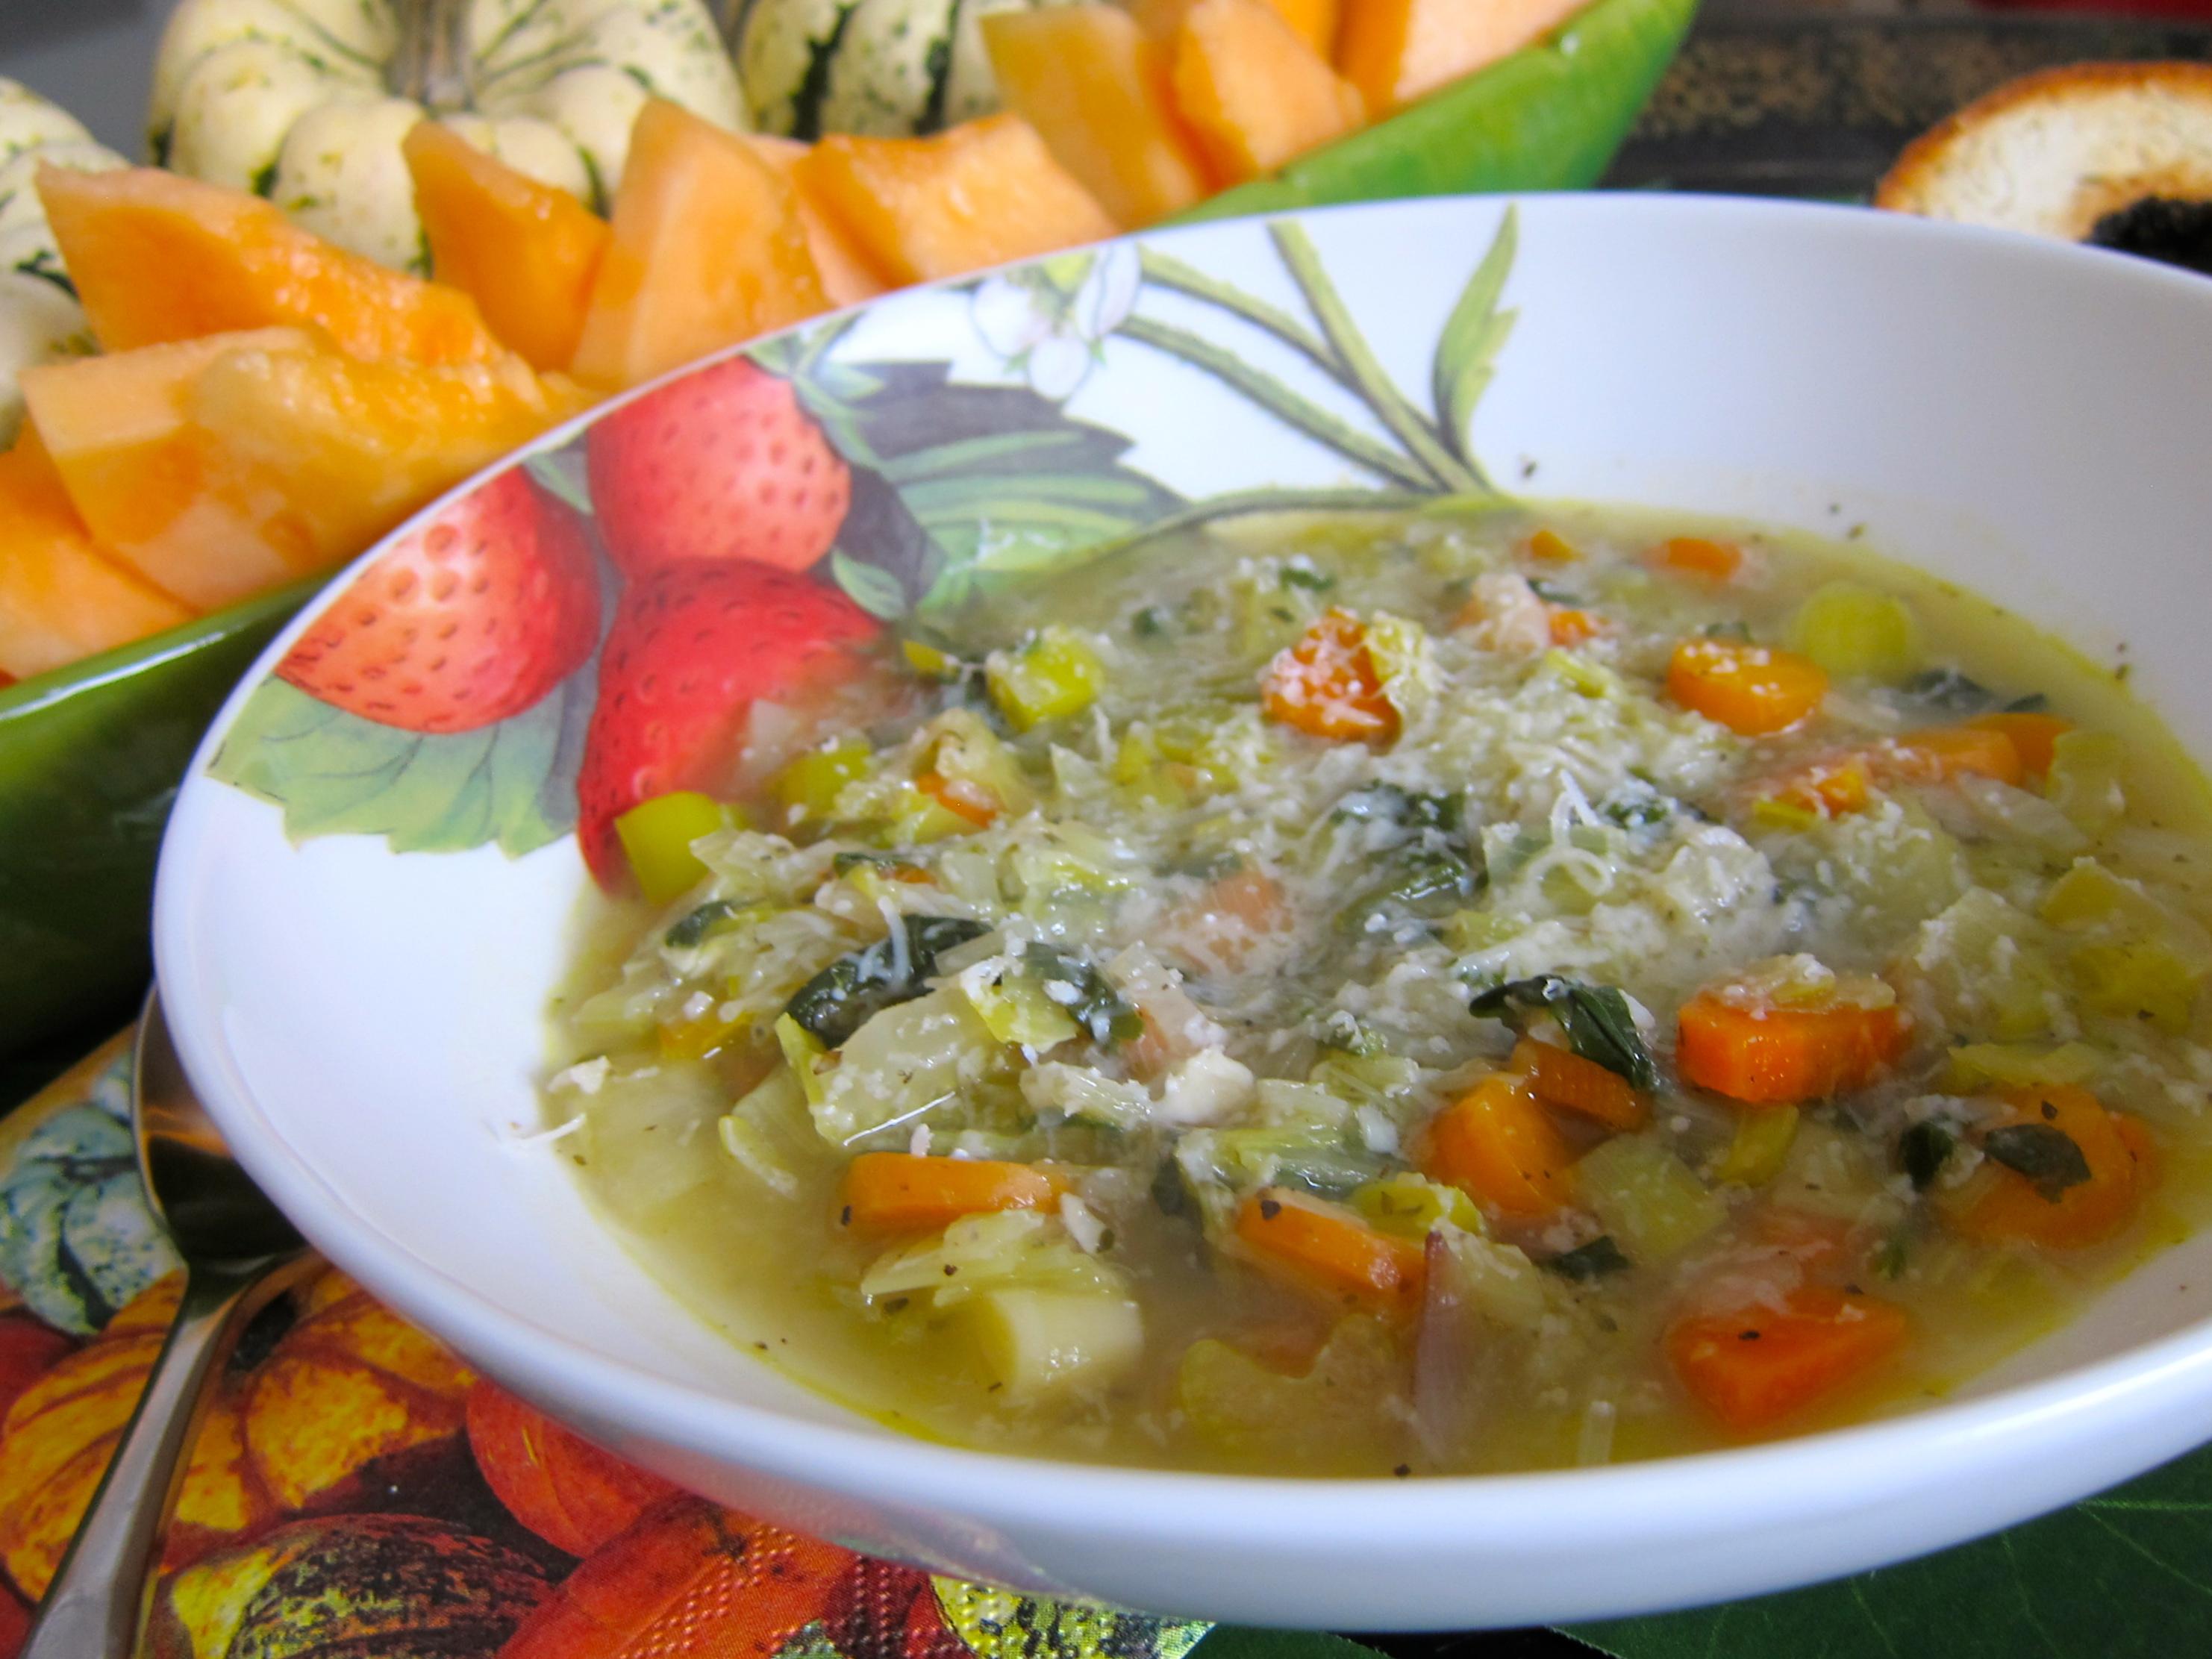 recipe2recipe leek soup, soup, soup recipe, leek,leeks, healthy leek recipe, leek recipe, healthy recipe, recipe, soup, soup recipe